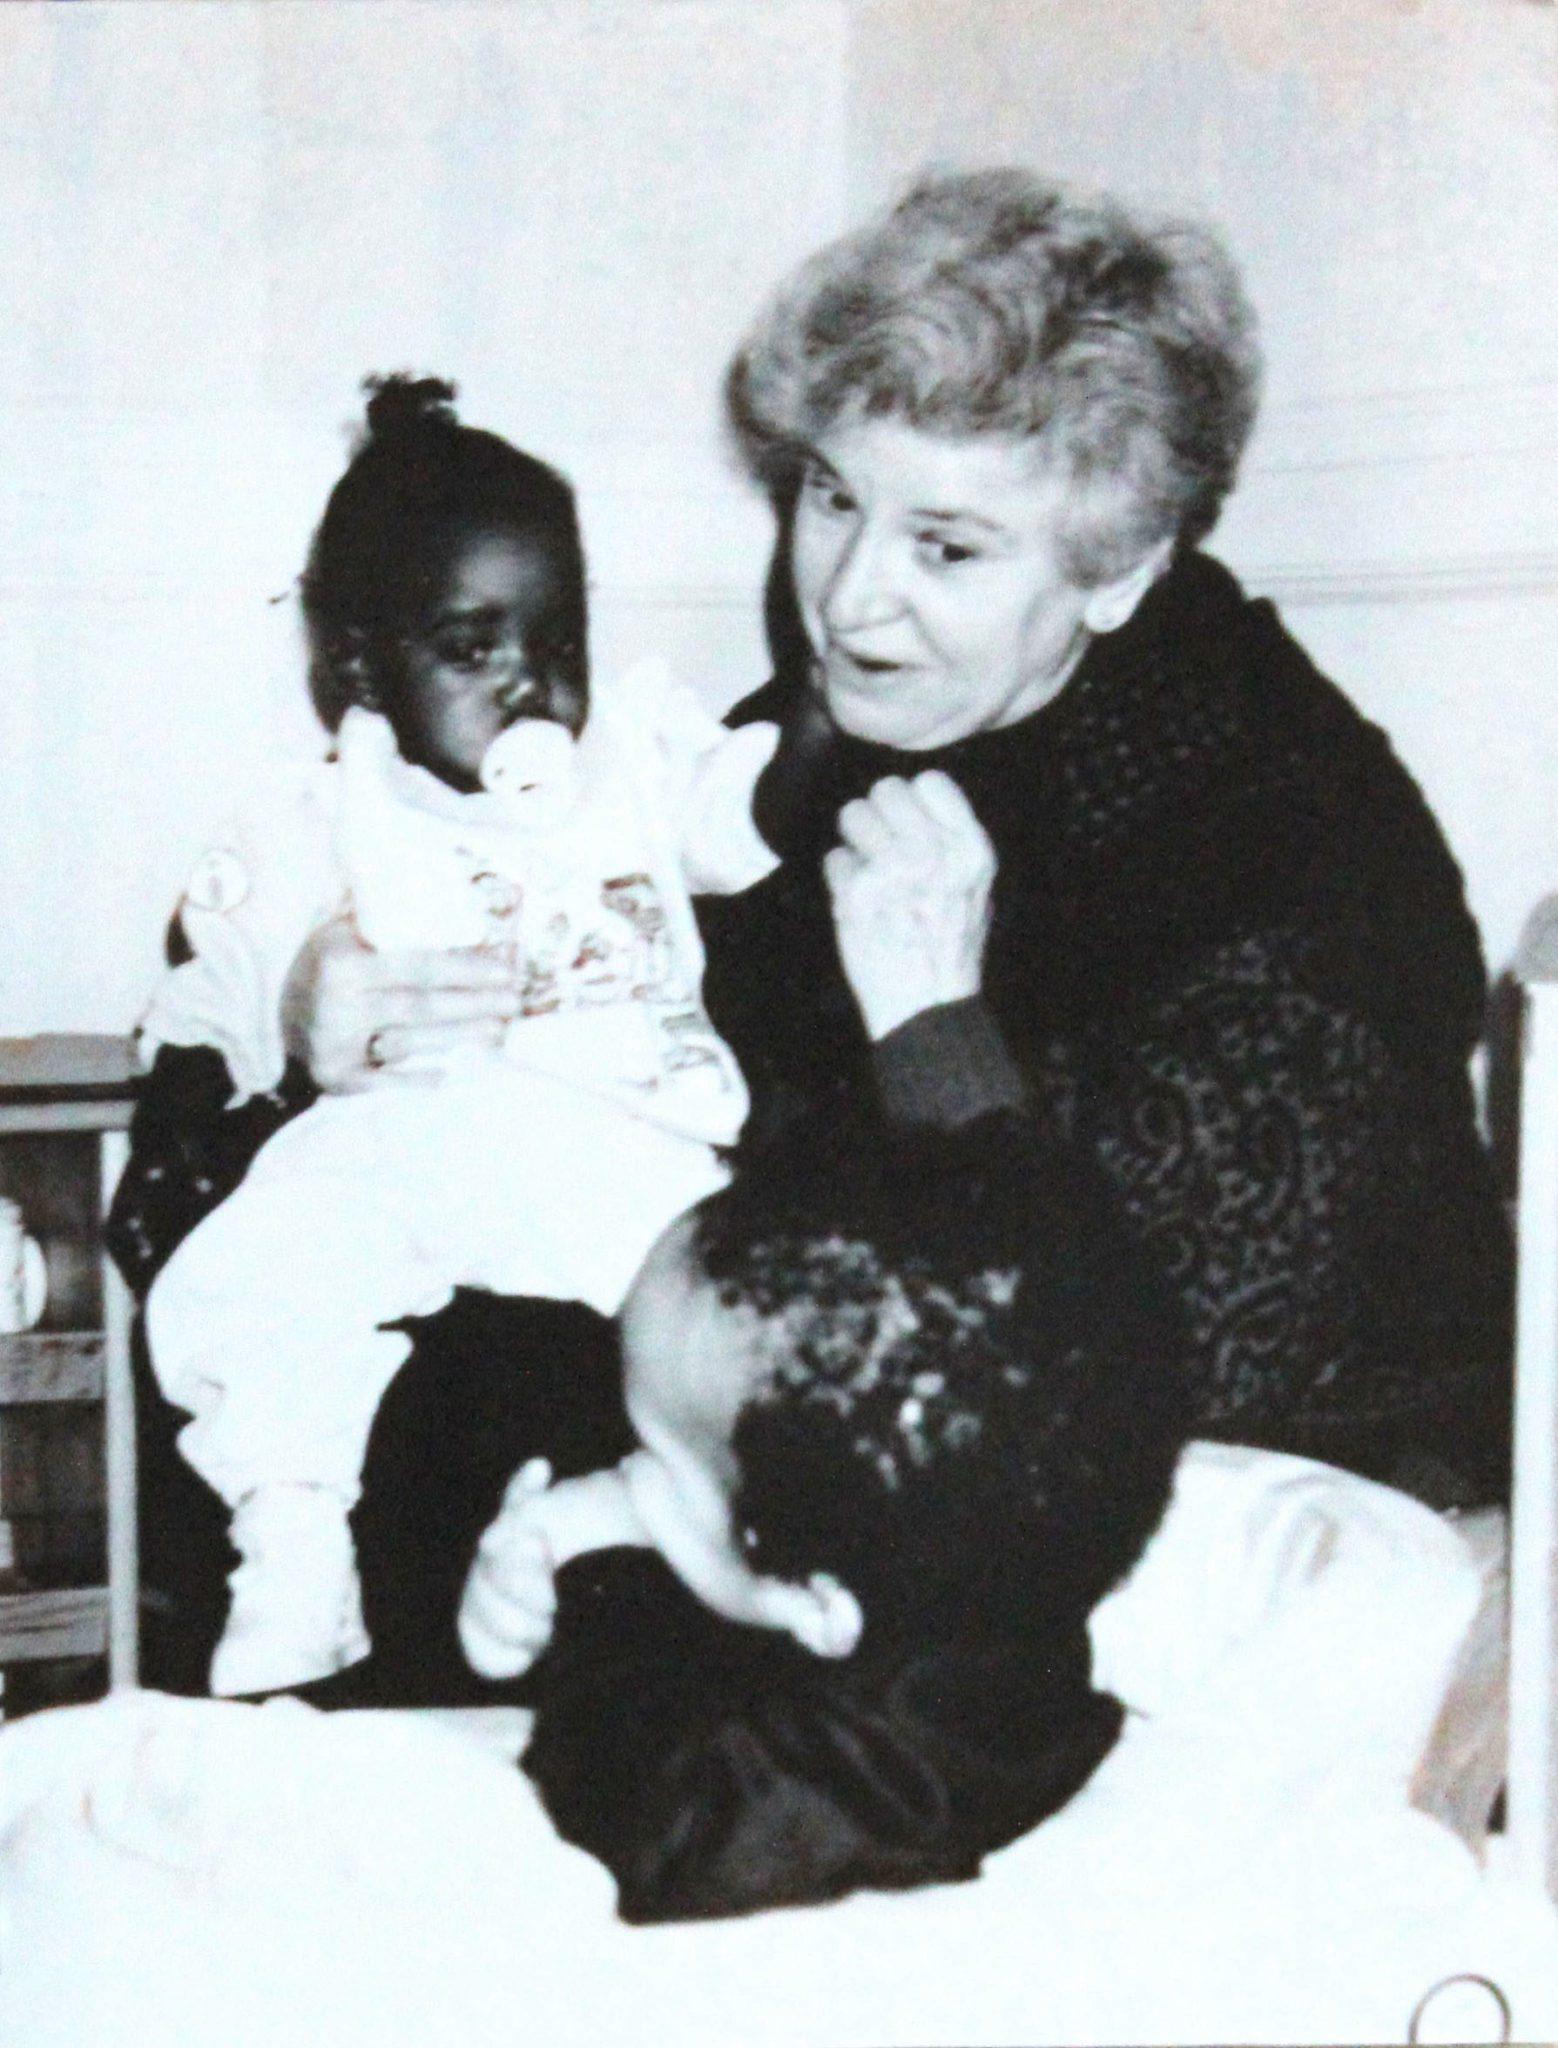 1989 – Incarnation Children's Center, NYC